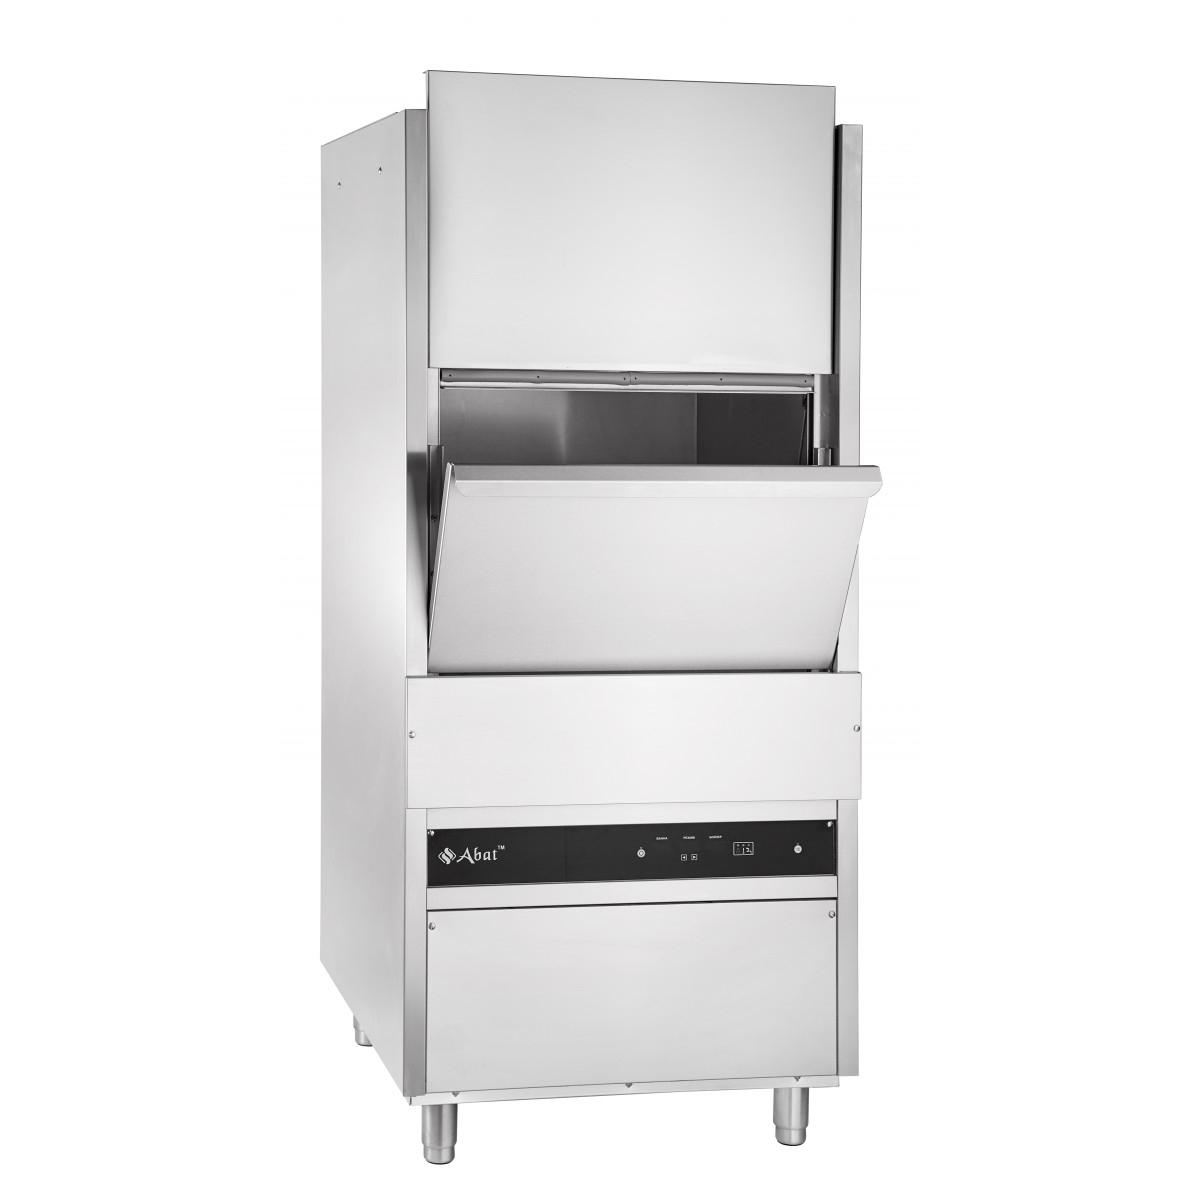 Посудомоечная машина ЧувашТоргТехника МПК-65-65